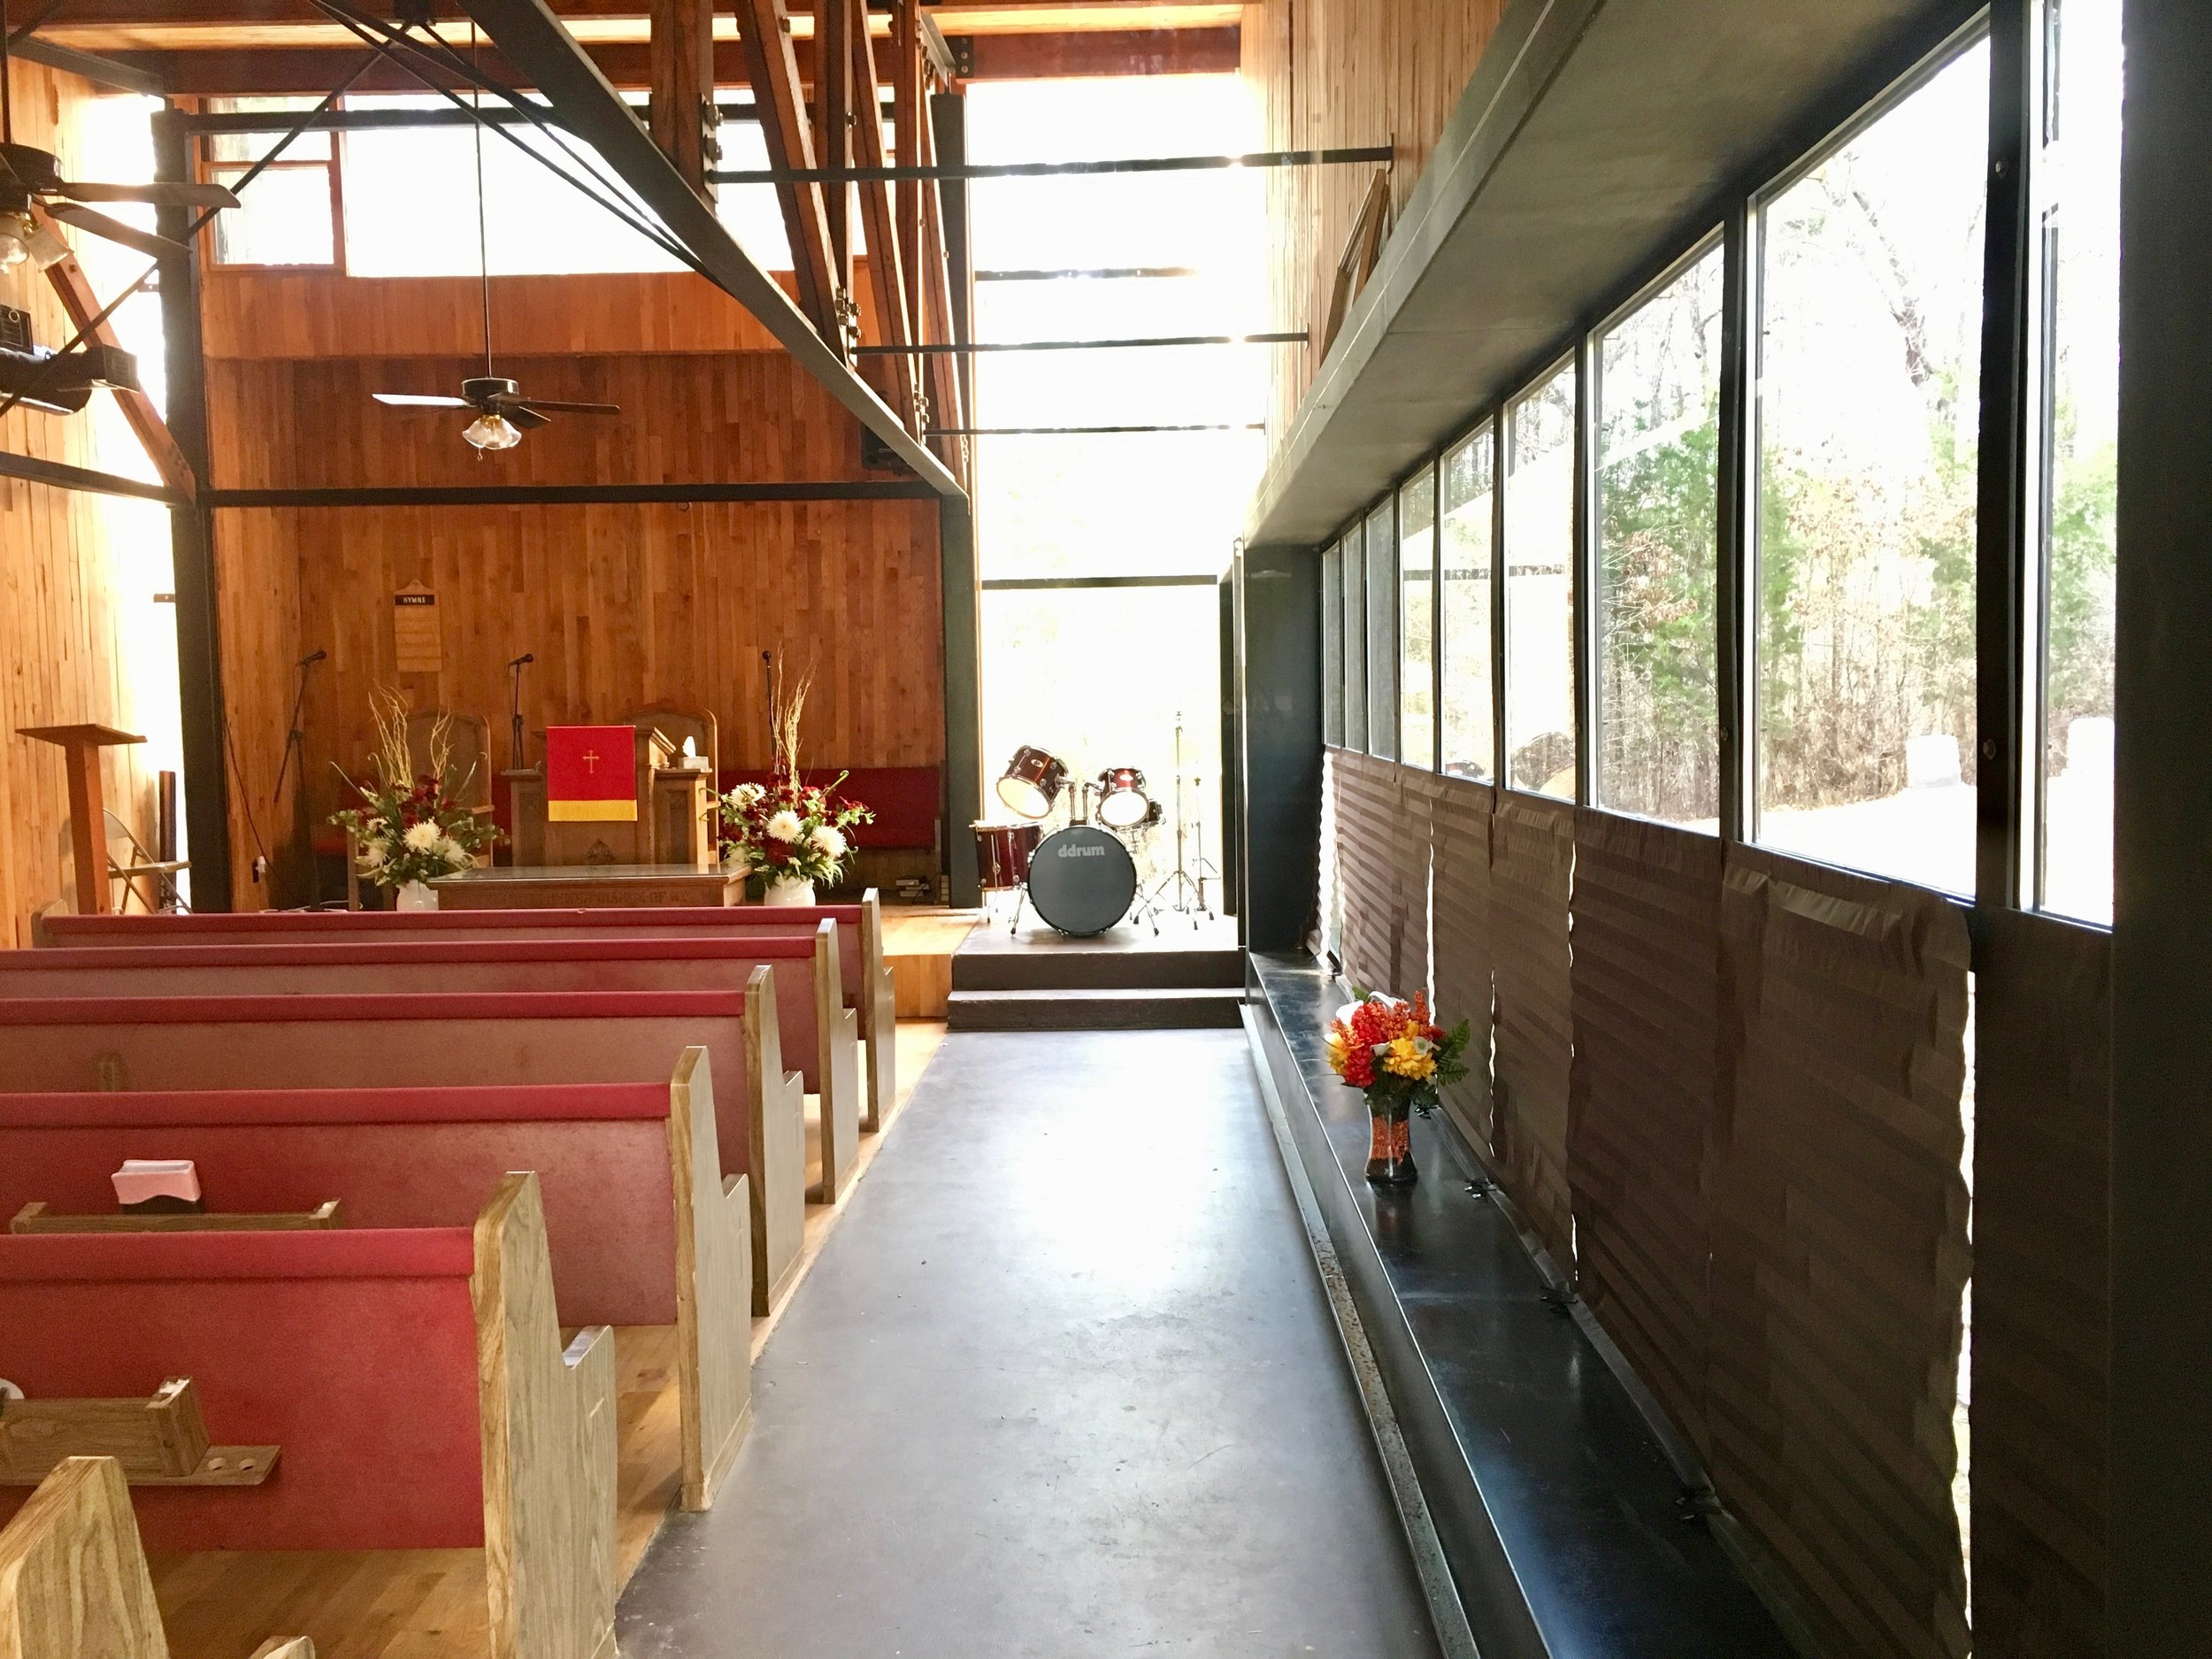 Antioch Baptist Church outside of Greensboro